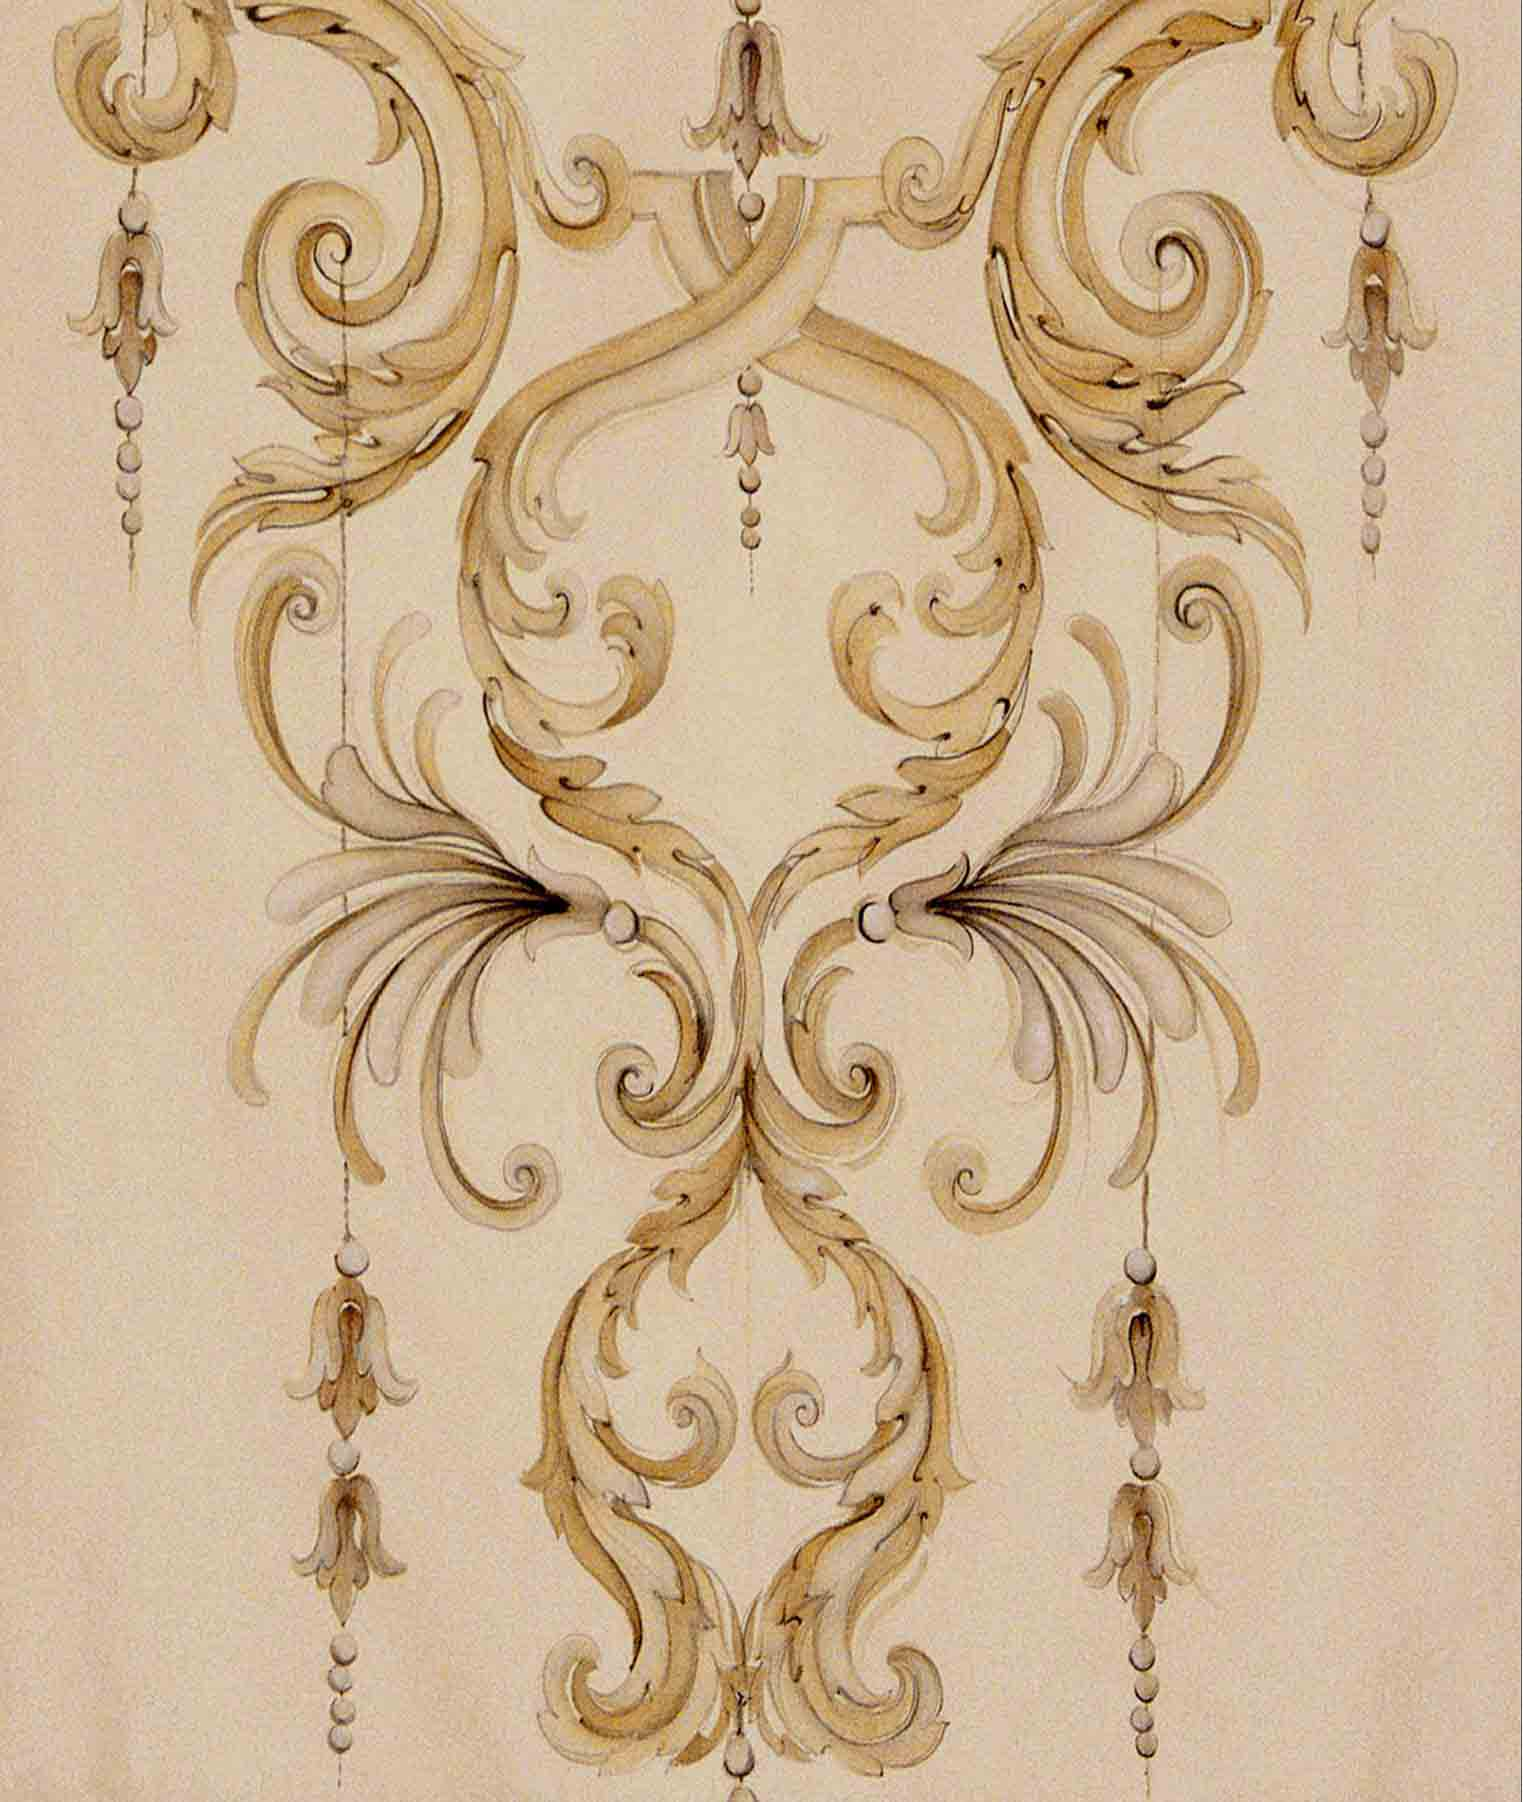 bery designs hand painted fabrics adam. Black Bedroom Furniture Sets. Home Design Ideas